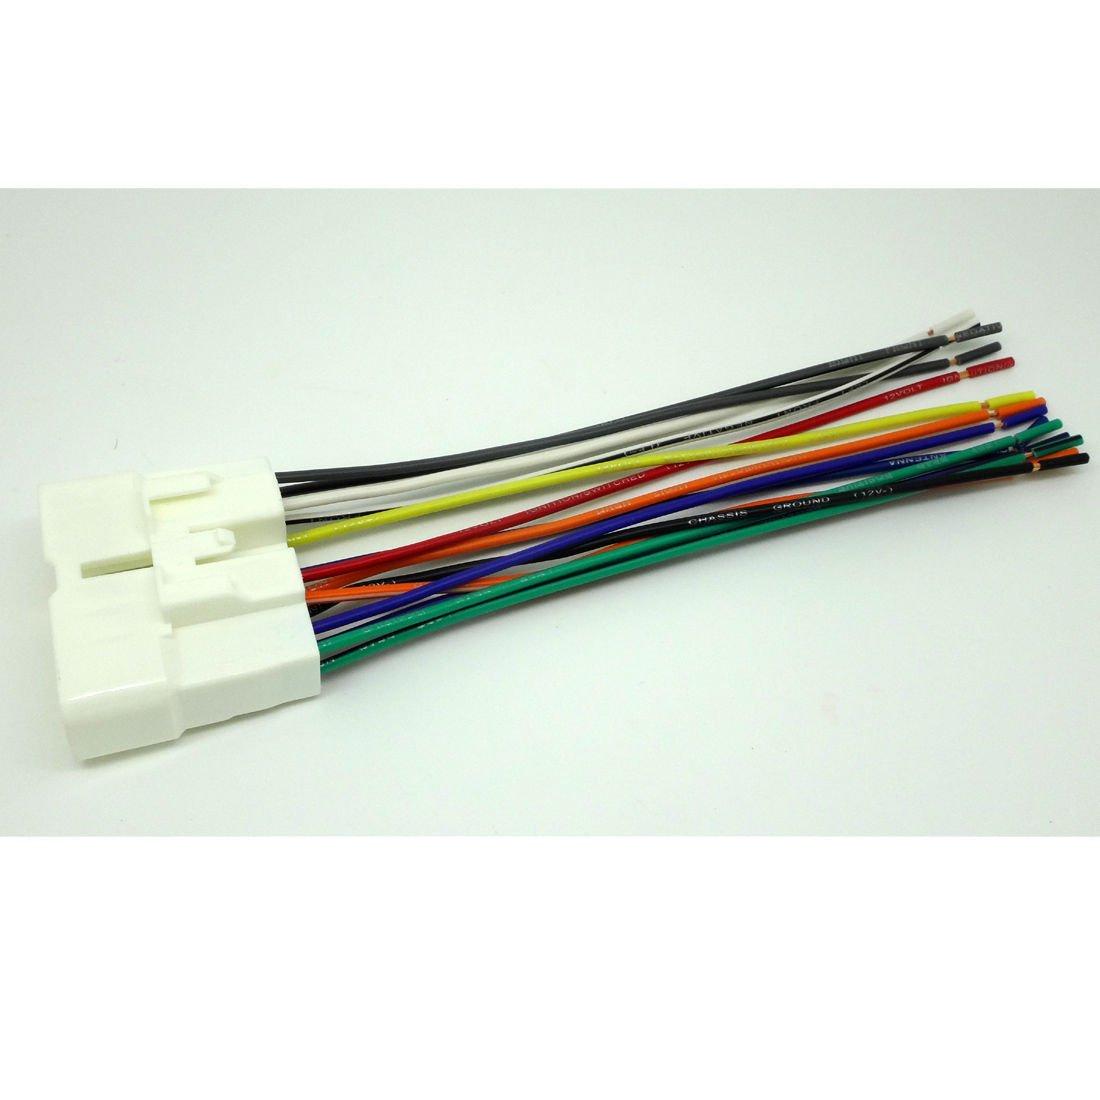 isuzu radio wiring amazon com conpus car stereo cd player wiring harness wire isuzu npr radio wiring diagram conpus car stereo cd player wiring